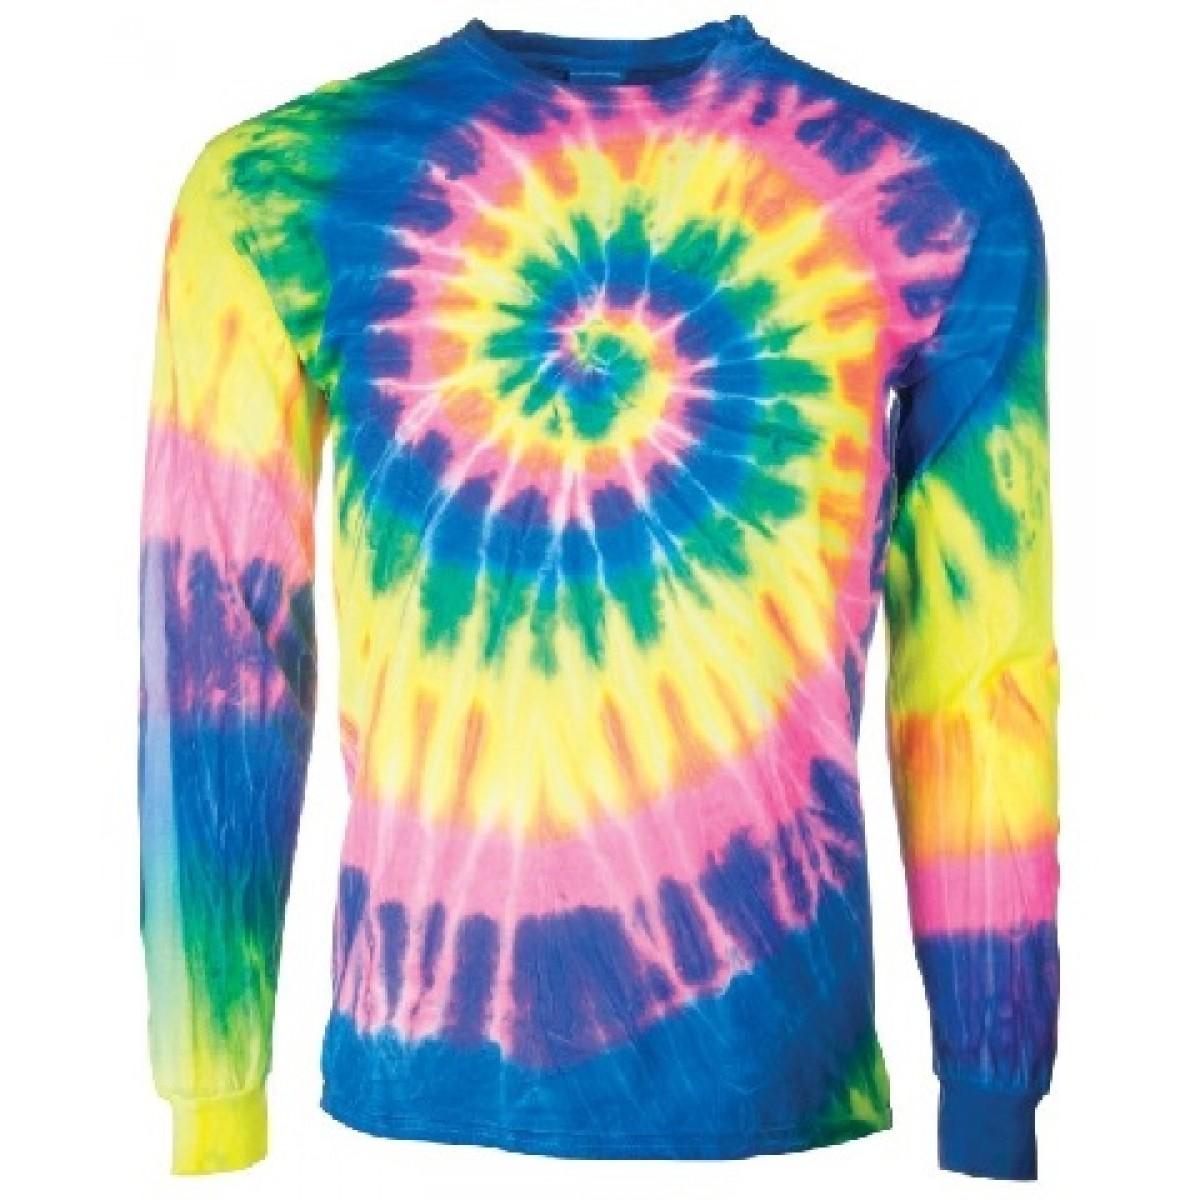 Spiral Tie Dye Long Sleeve Flo Rainbow-Rainbow-M